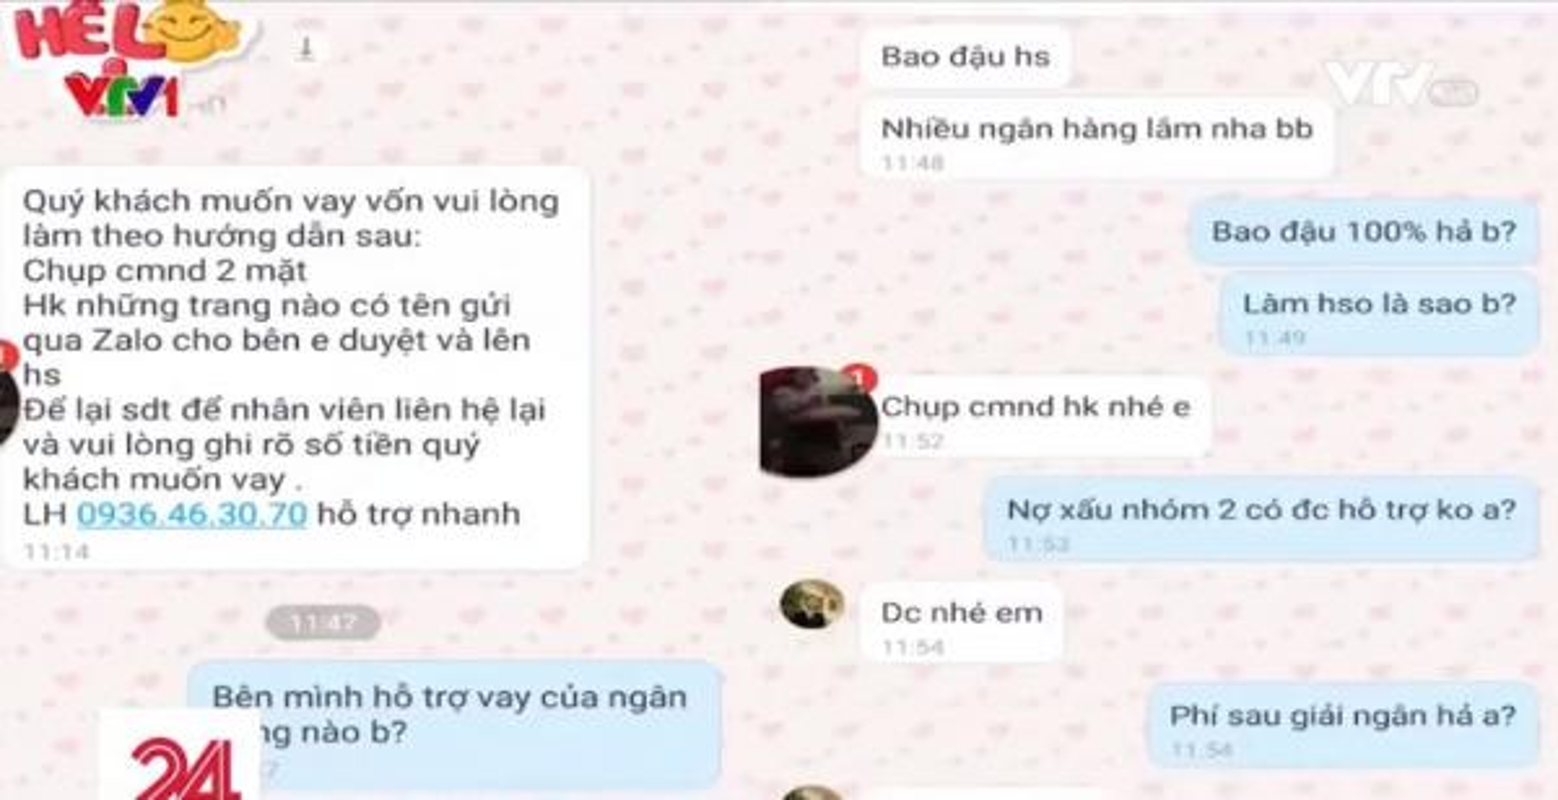 Vay tien online hiem hoa kho luong cho ban tre thieu hieu biet-Hinh-4